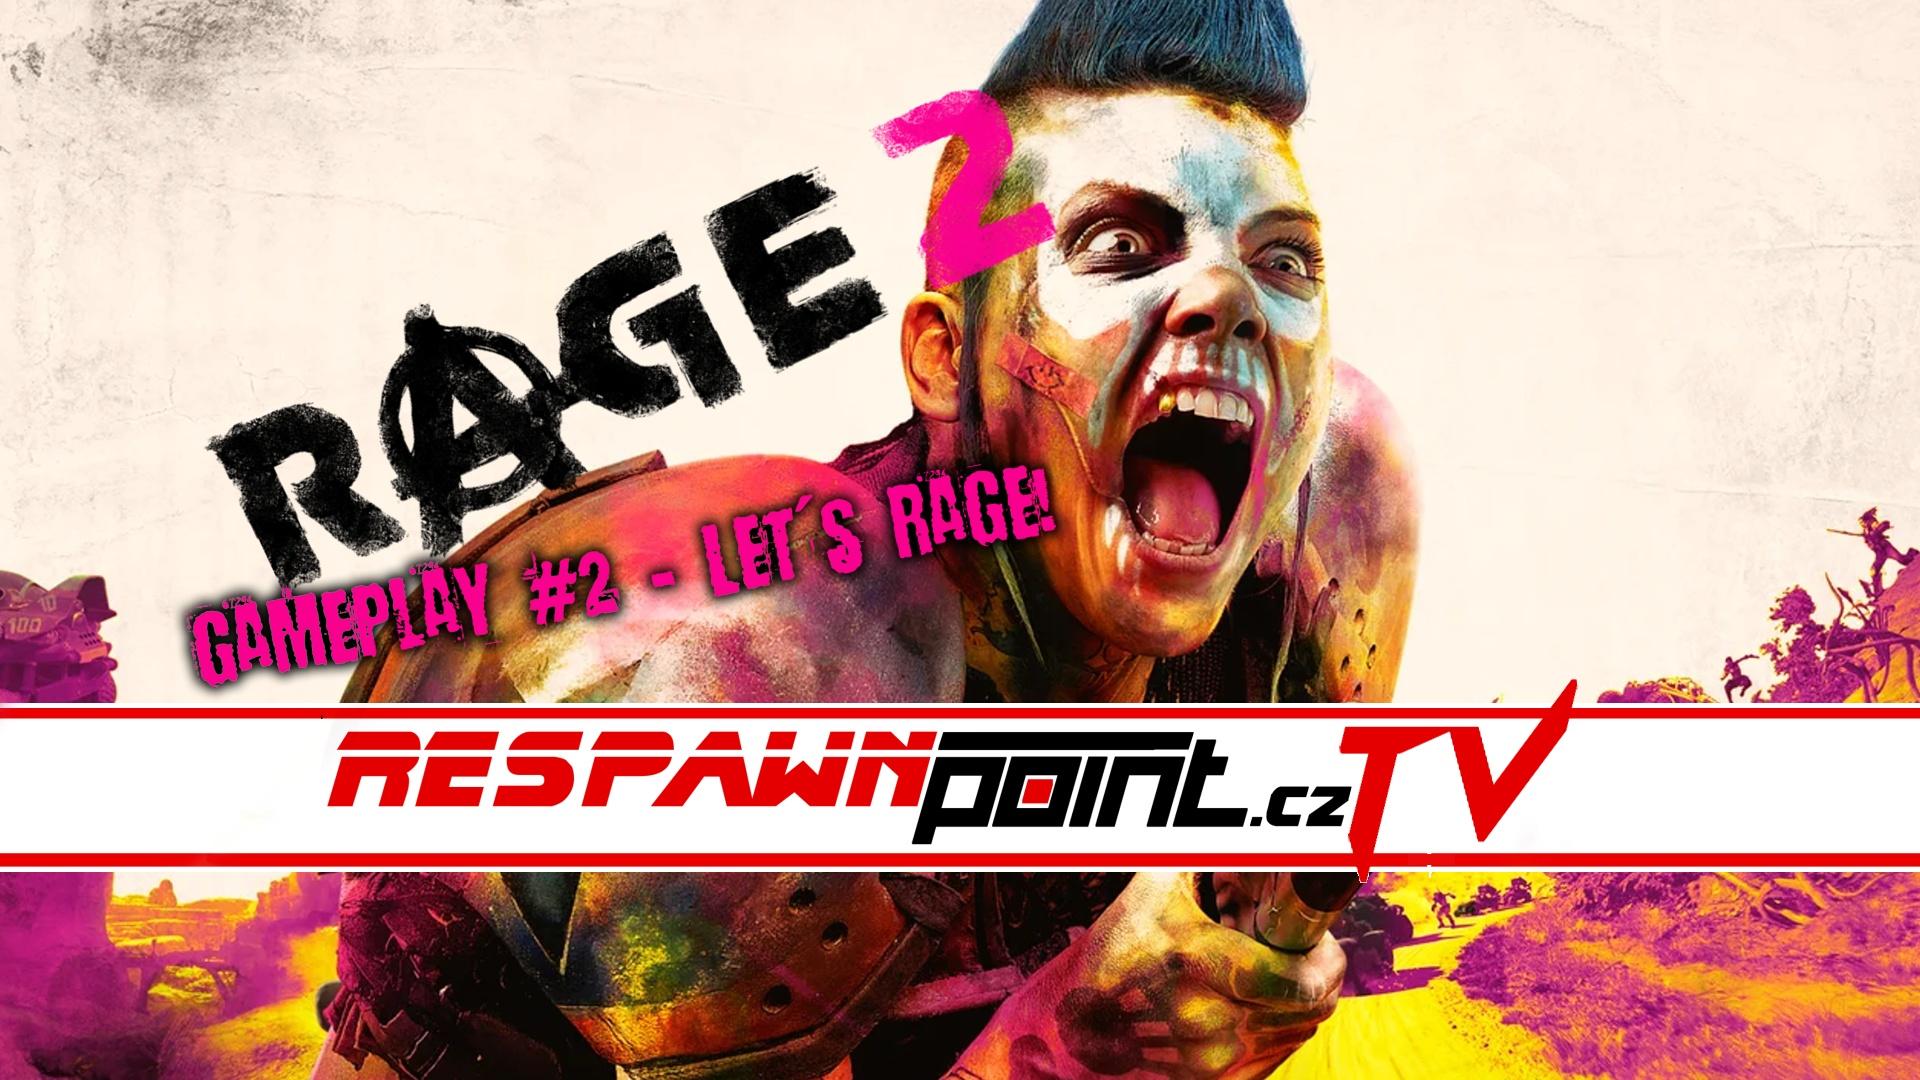 RAGE 2 – Gameplay #2 Let's Rage!